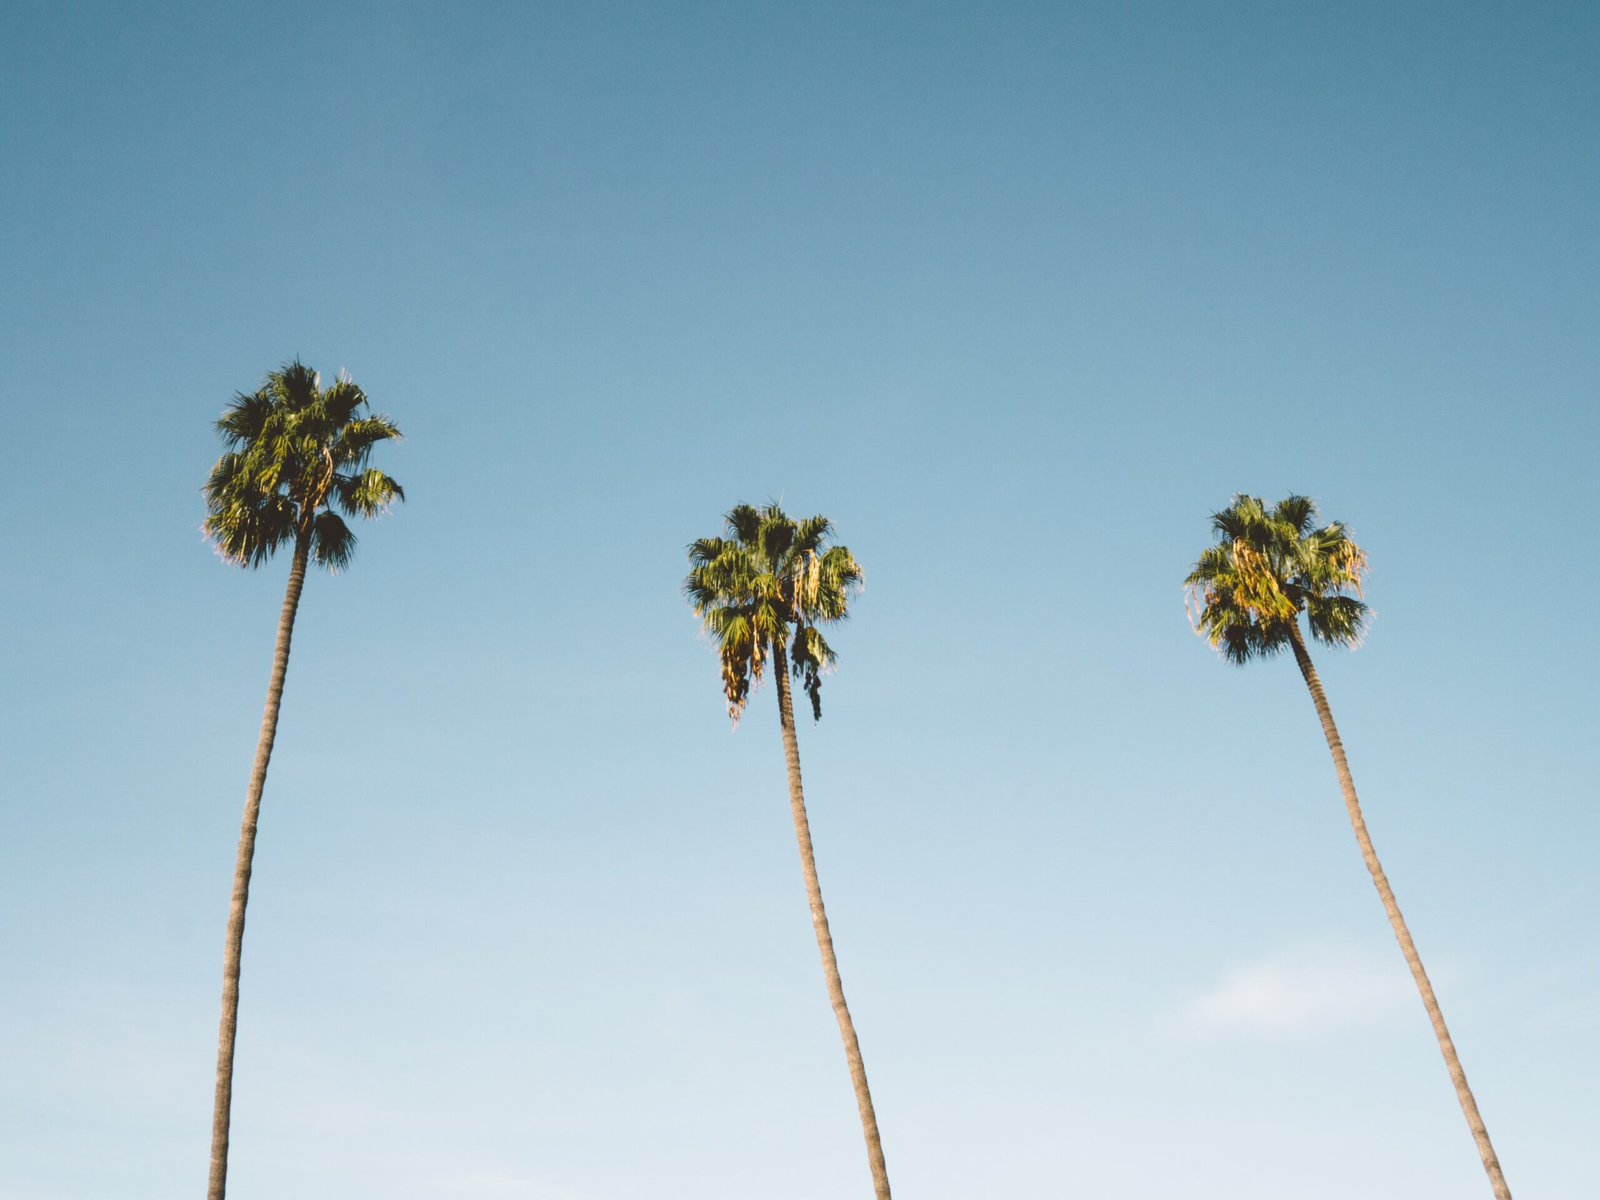 San Diego ARHE 2020